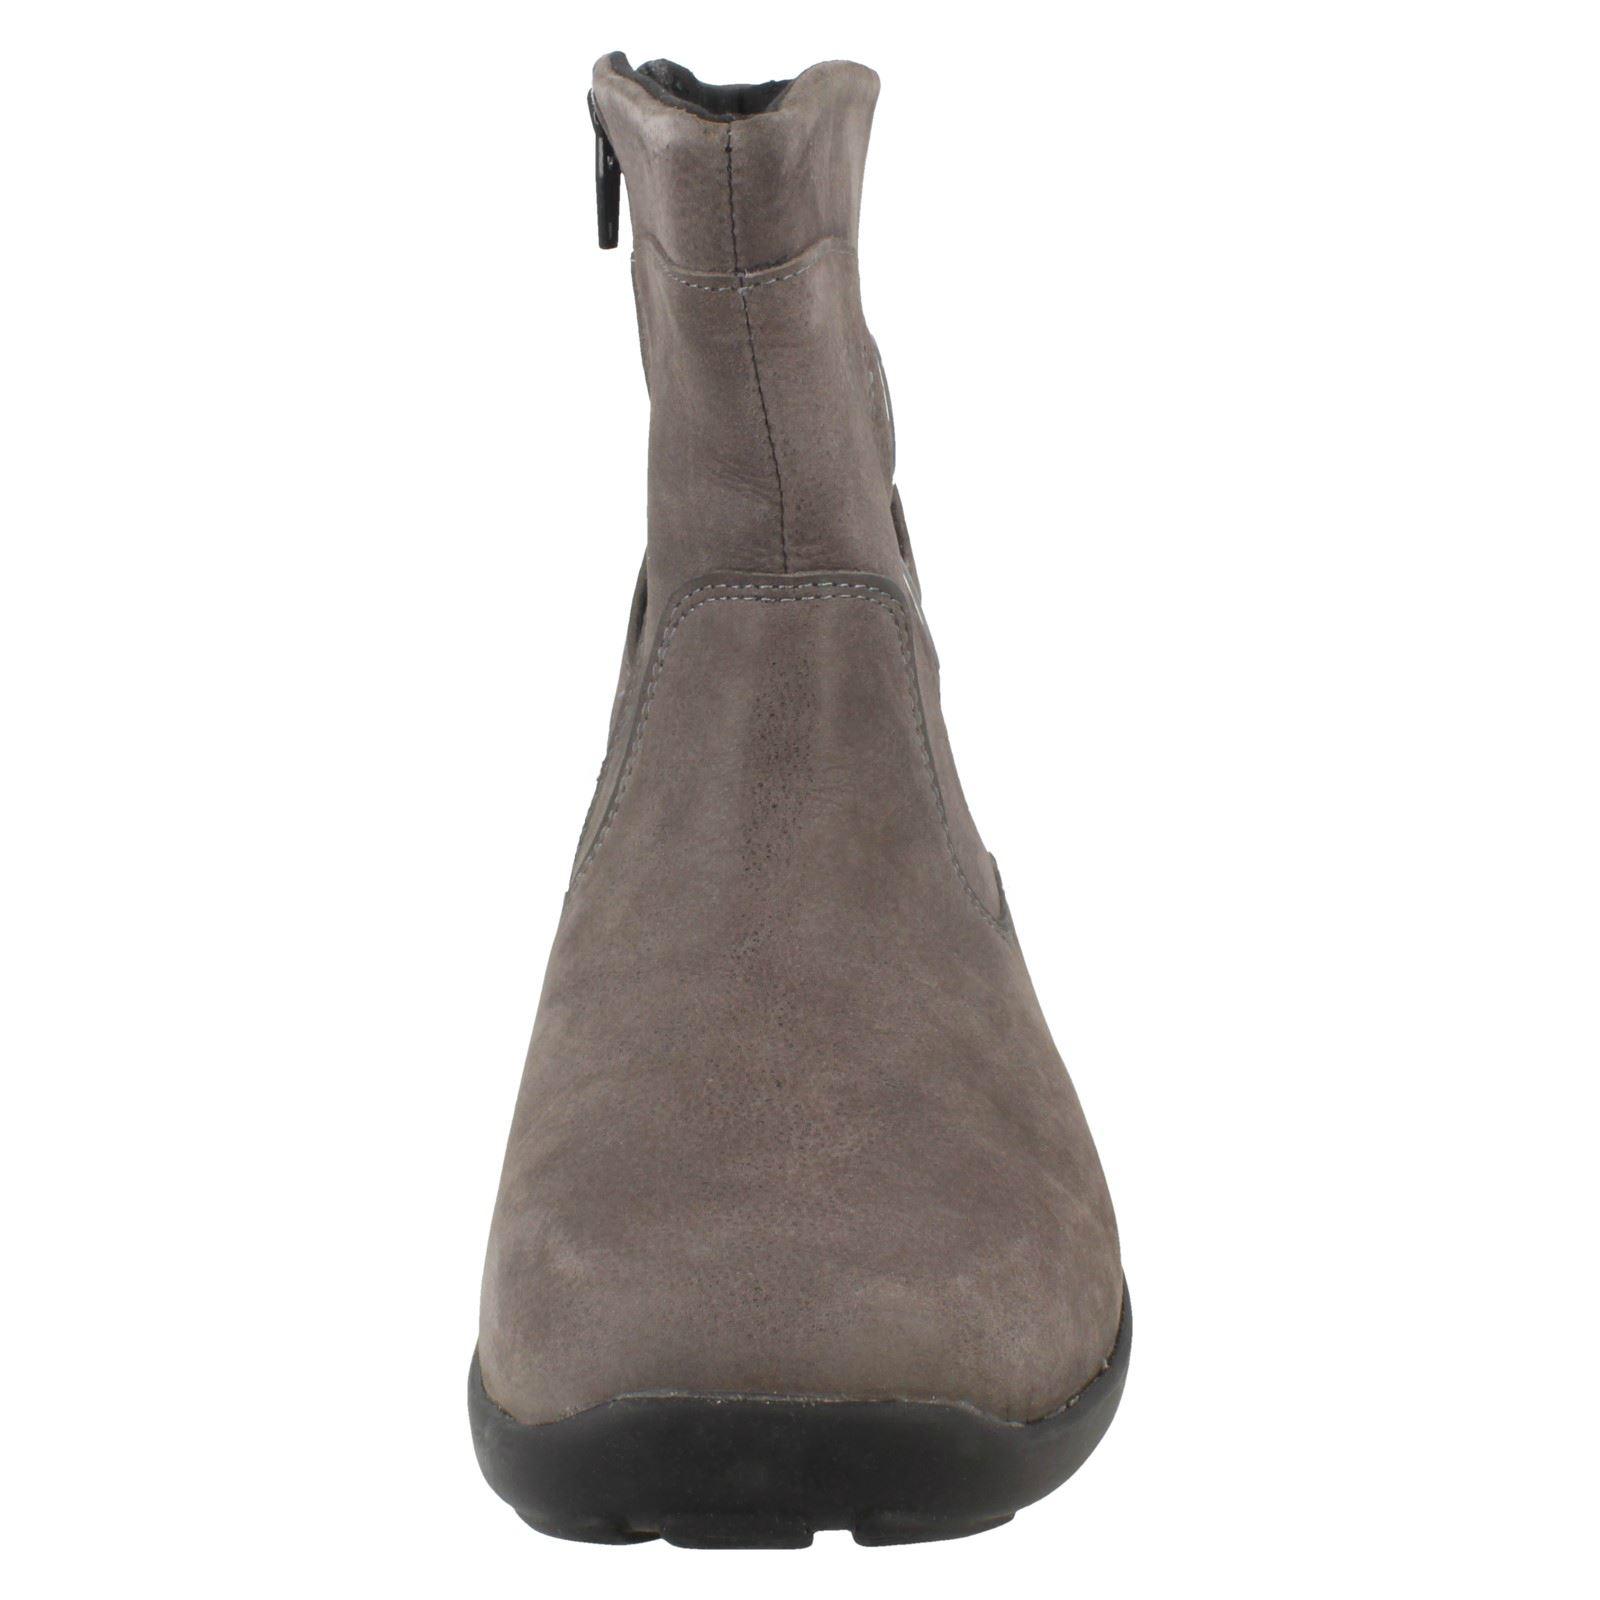 grey 78484g Ladies Easyb Smoke Ankle Grey Boots Reims WqWfwAa6H